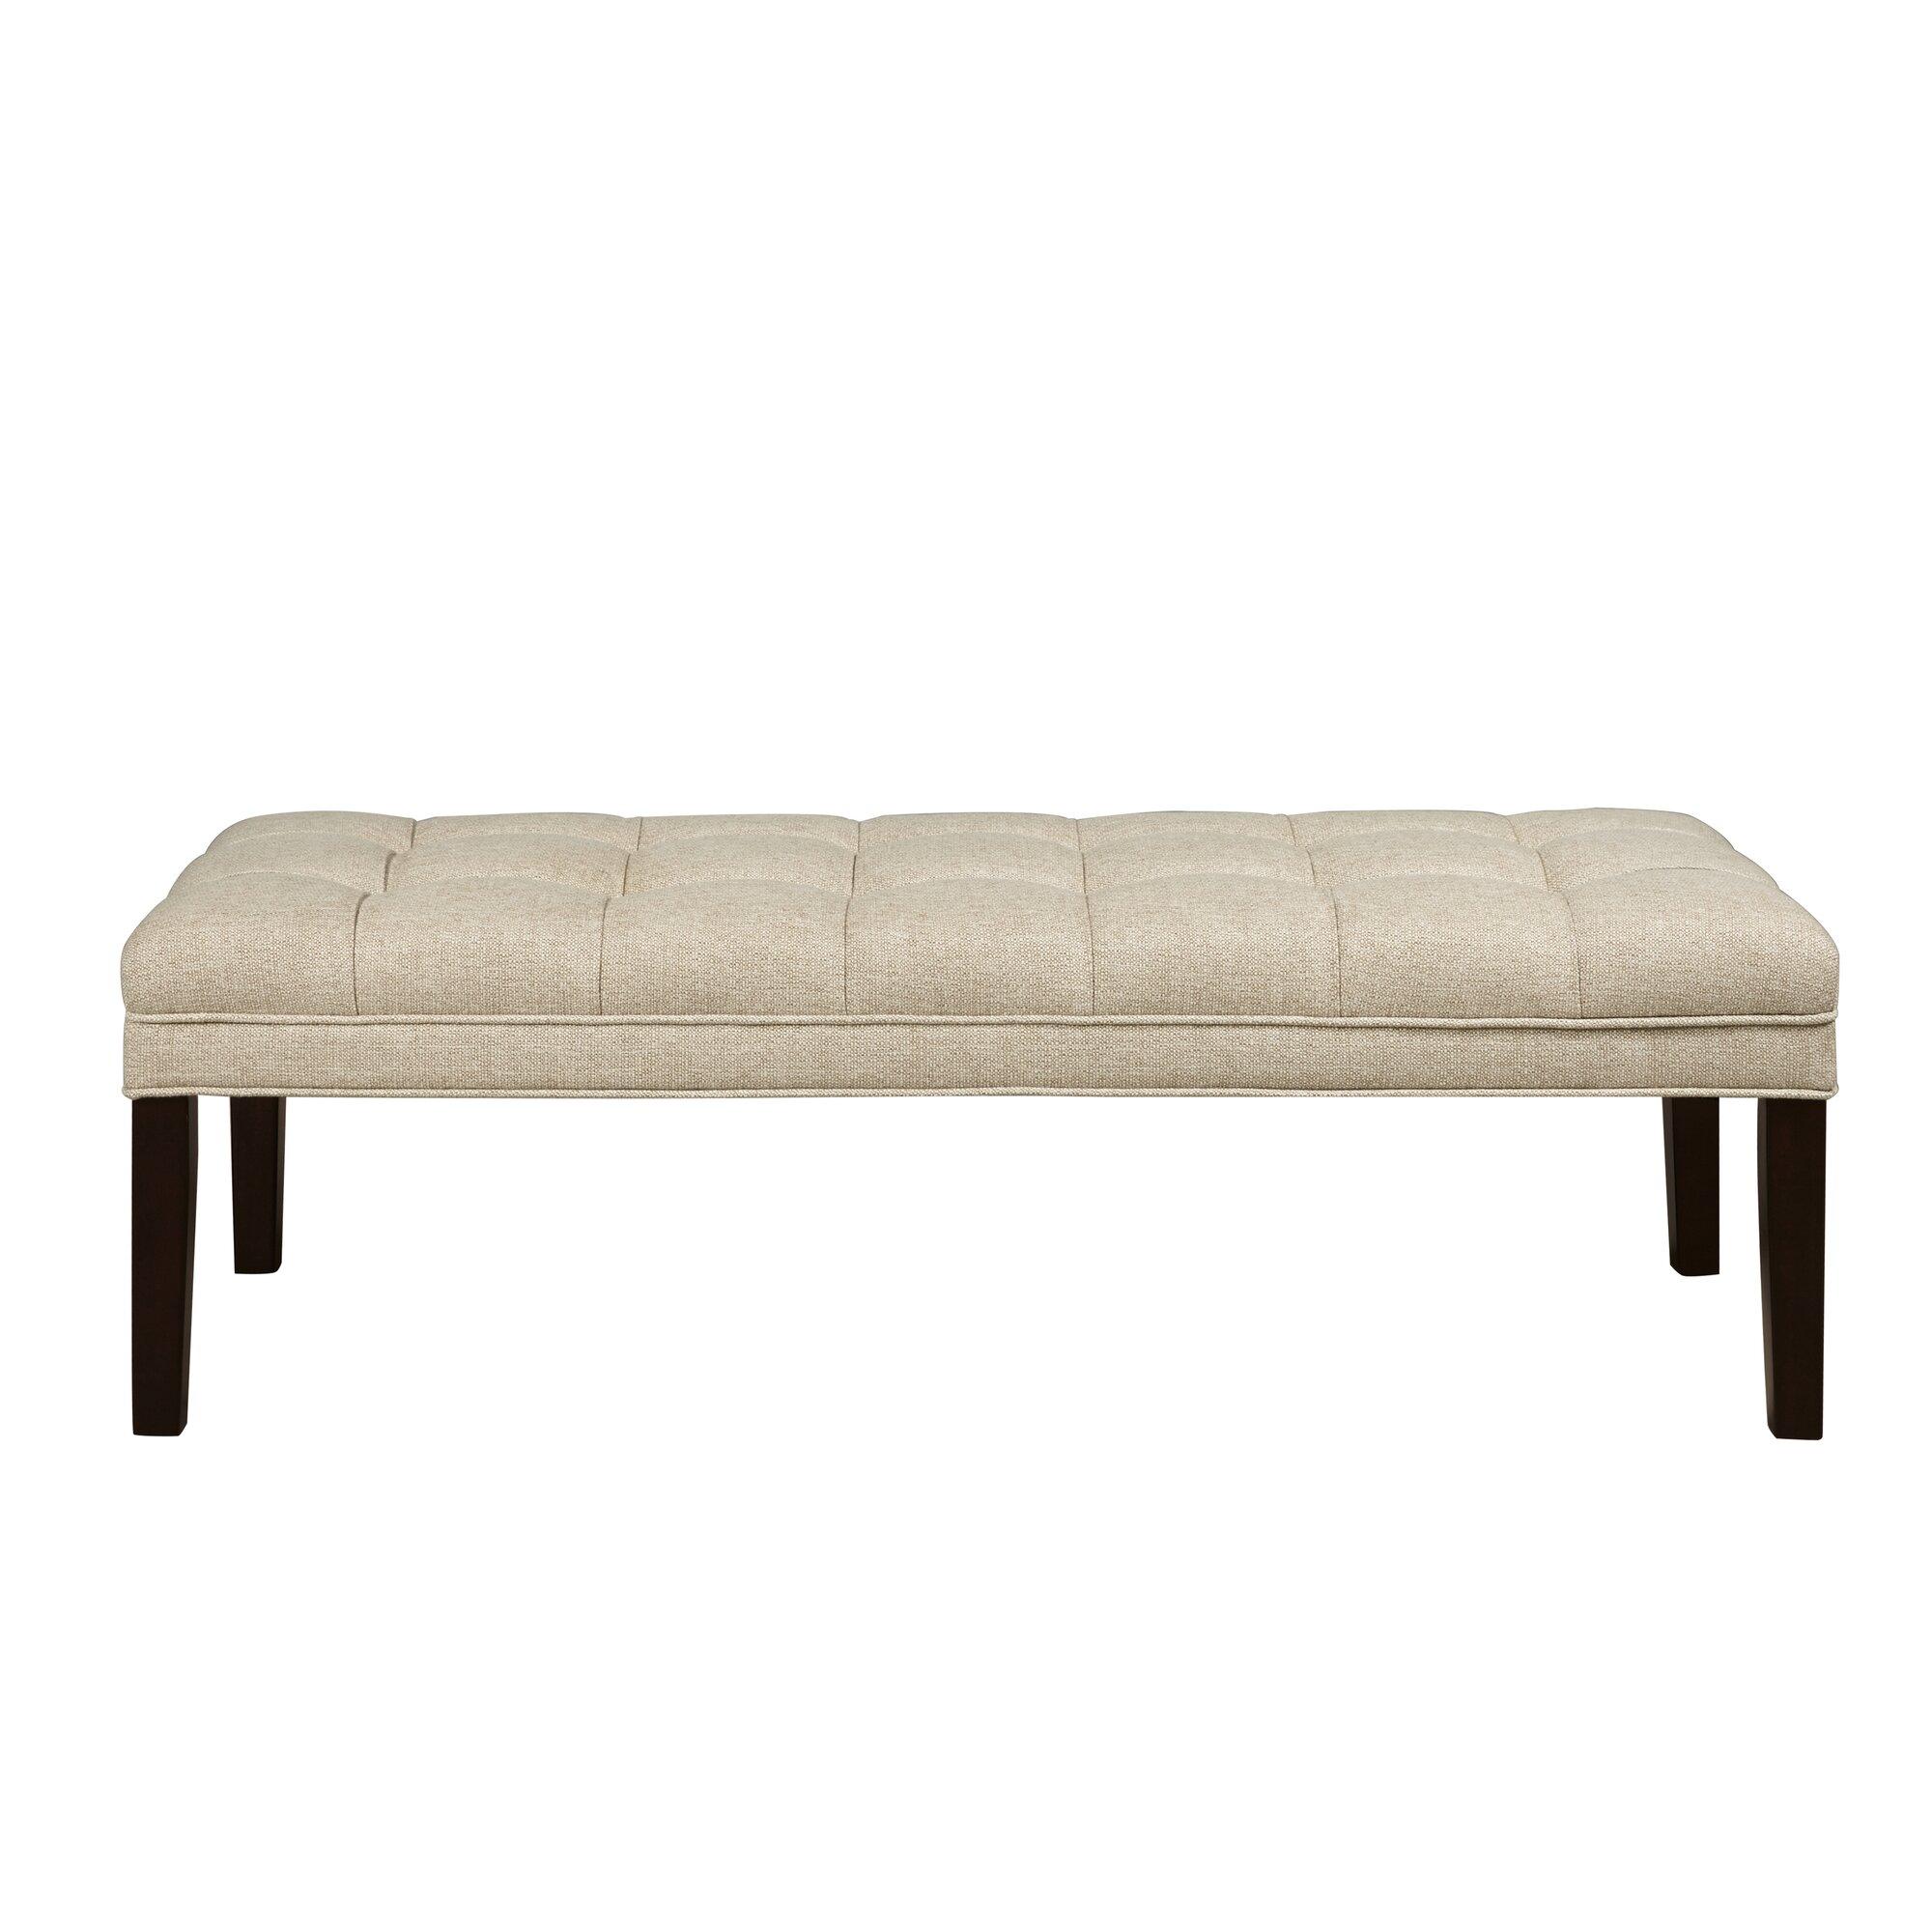 Bedroom bench dimensions - Upholstered Tufted Bedroom Bench